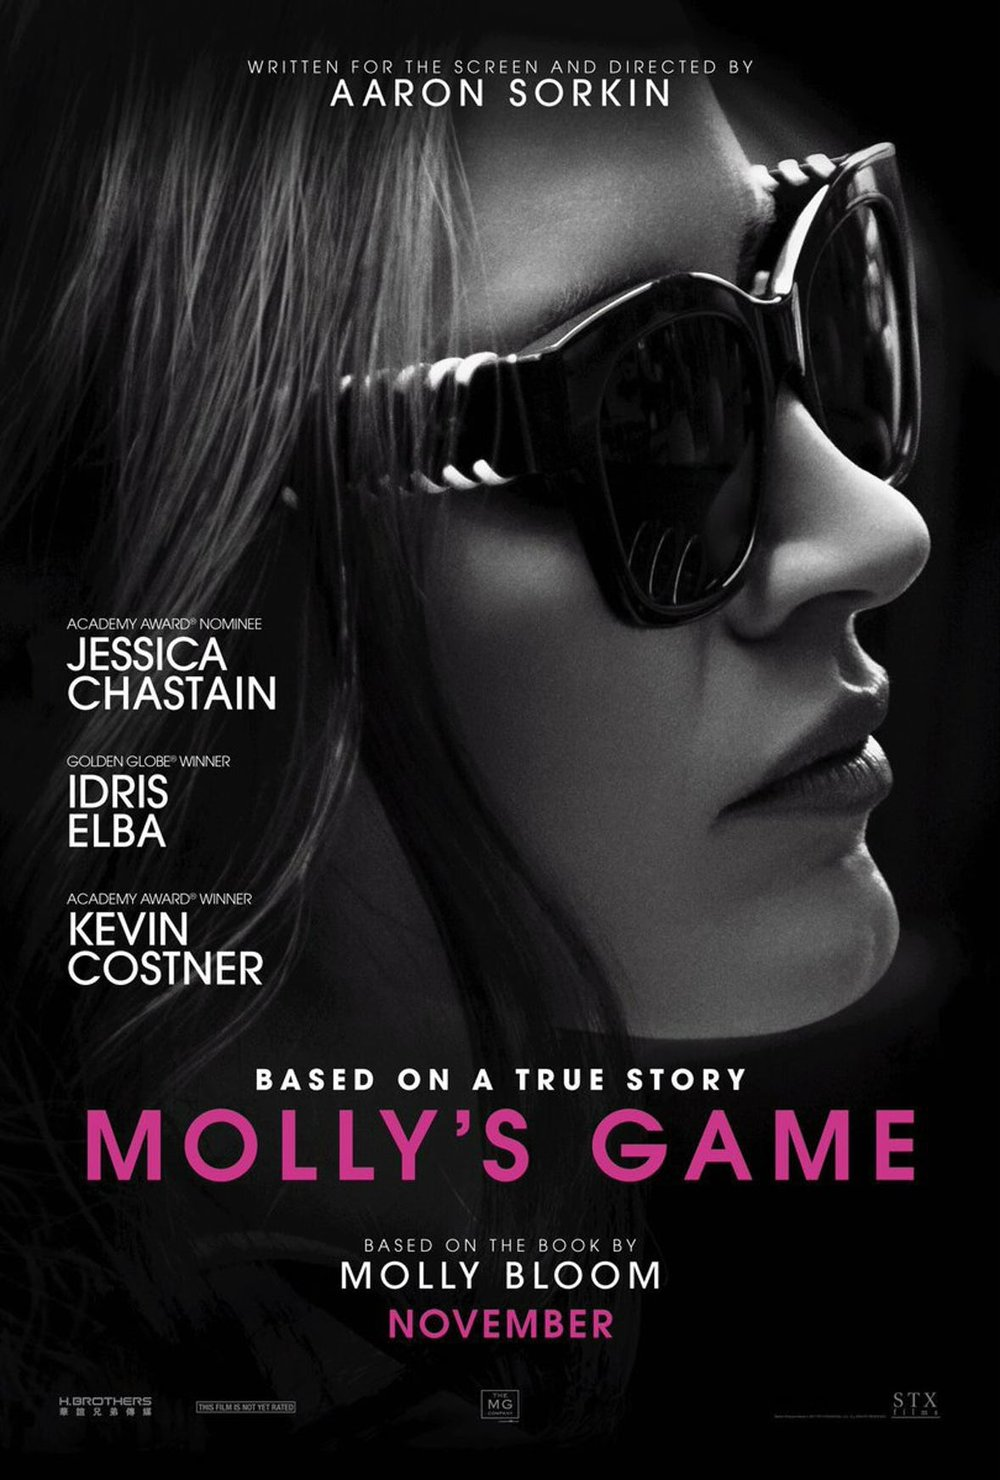 Mollys-Game-Poster.jpg